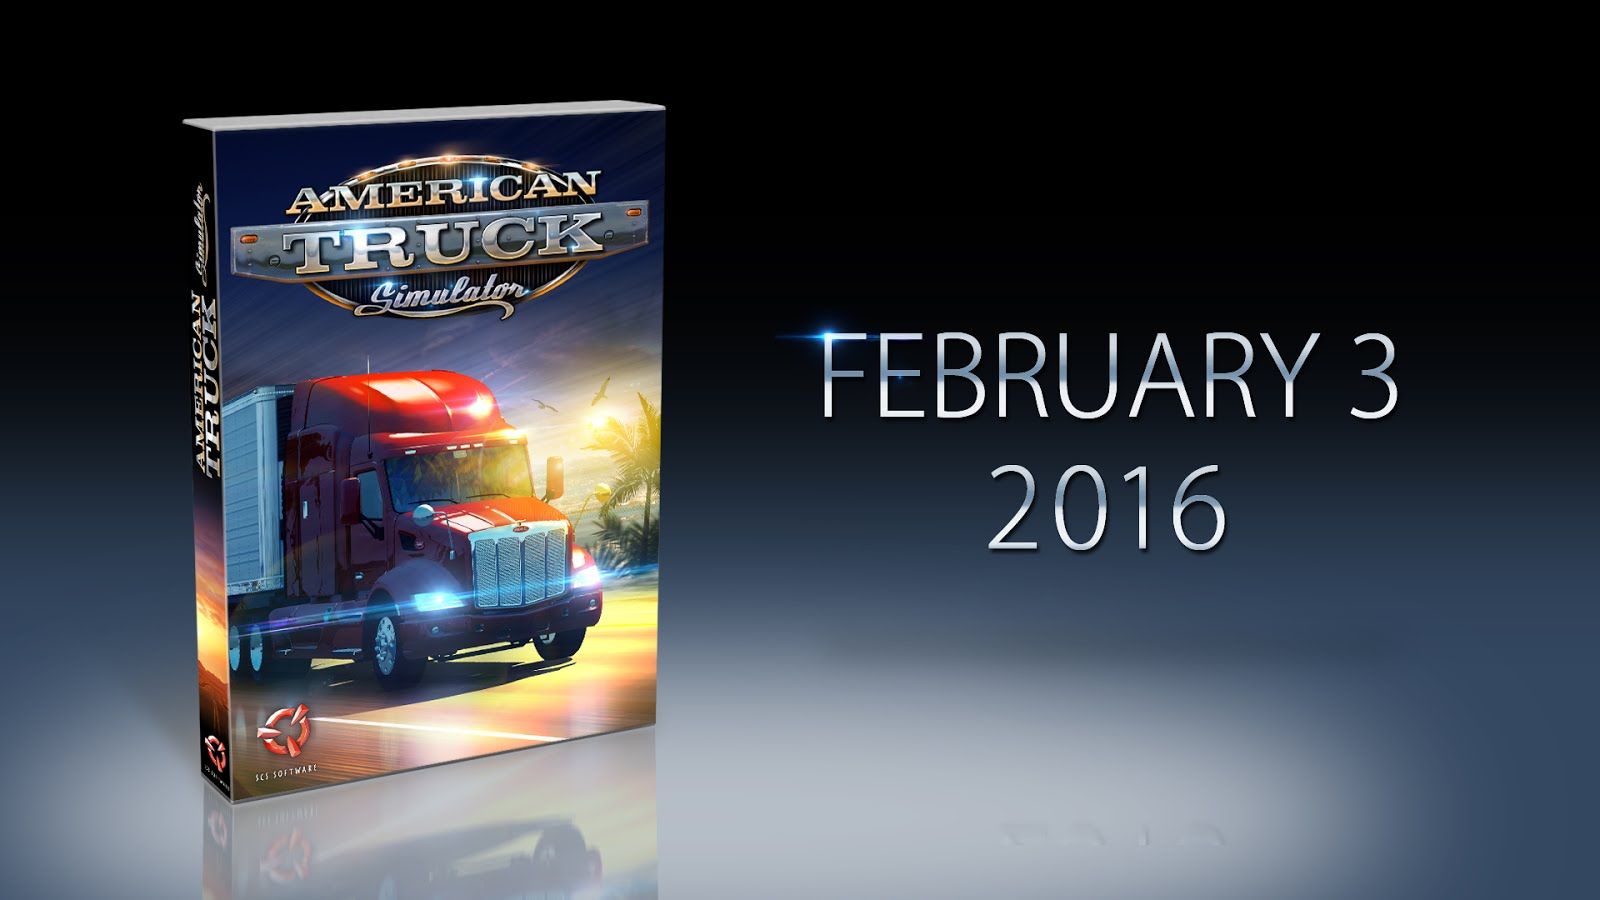 American Truck Simulator - 3 februari